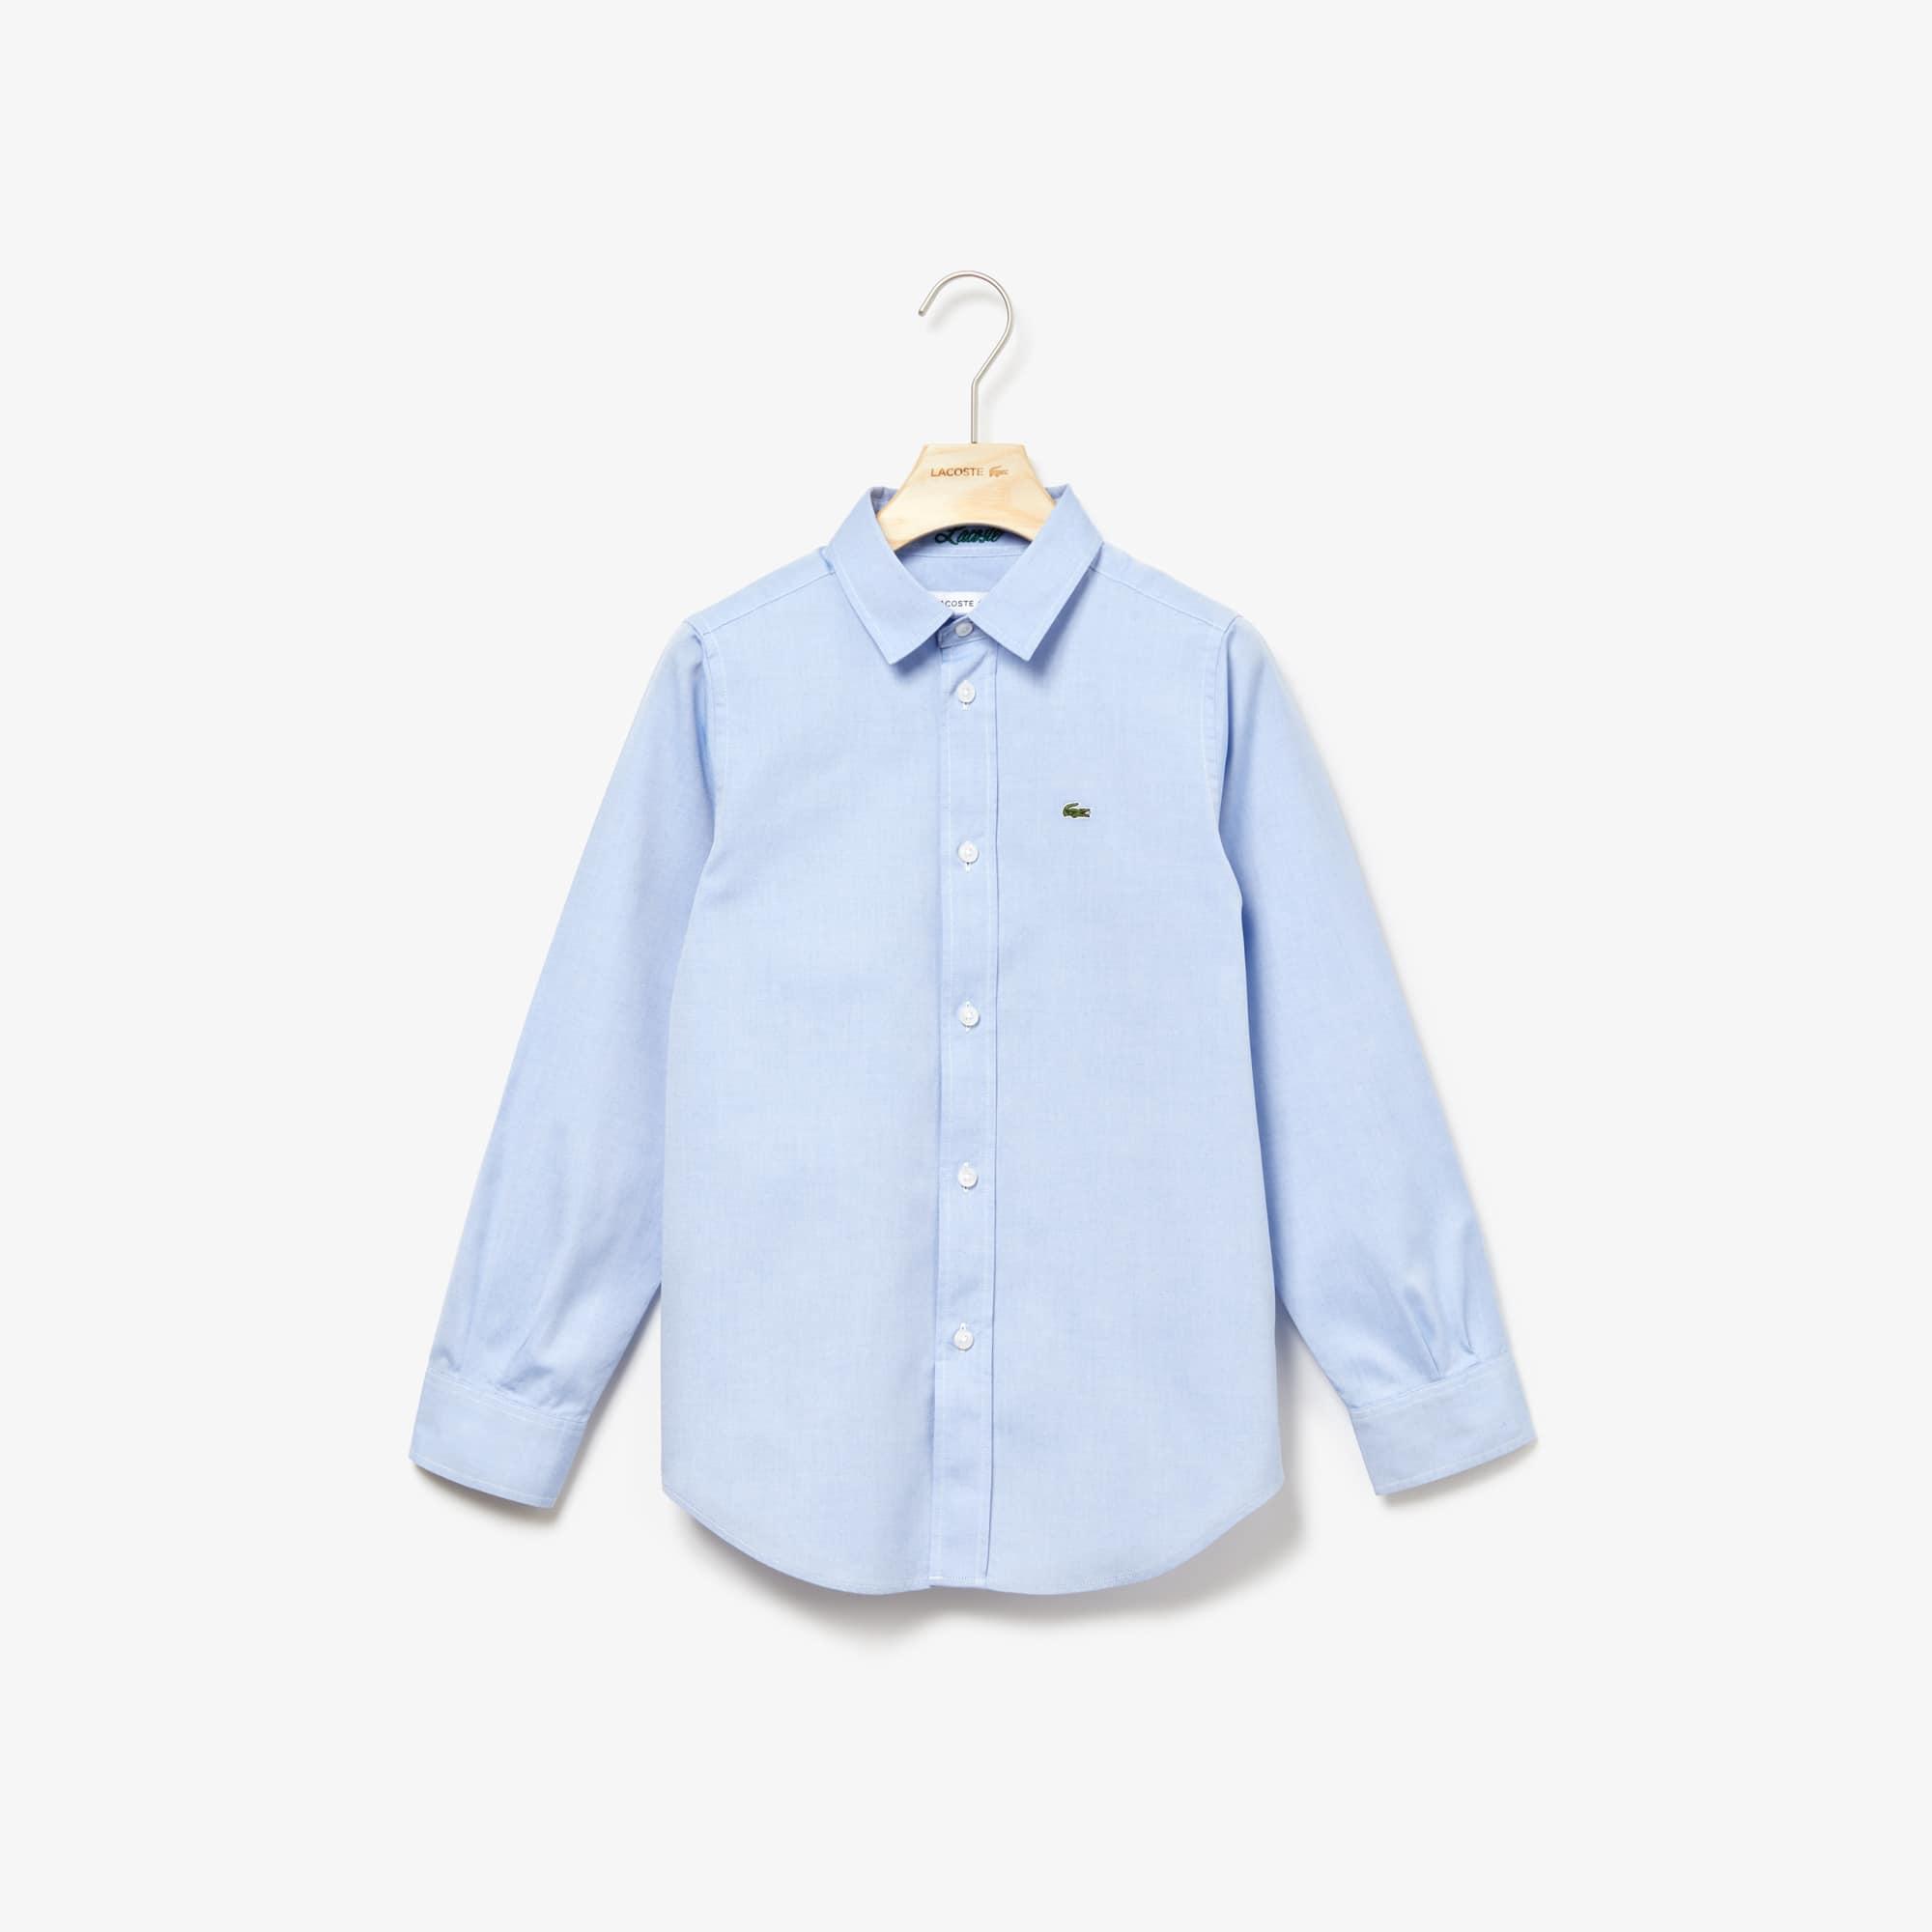 Kids' shirt in Oxford cotton knit